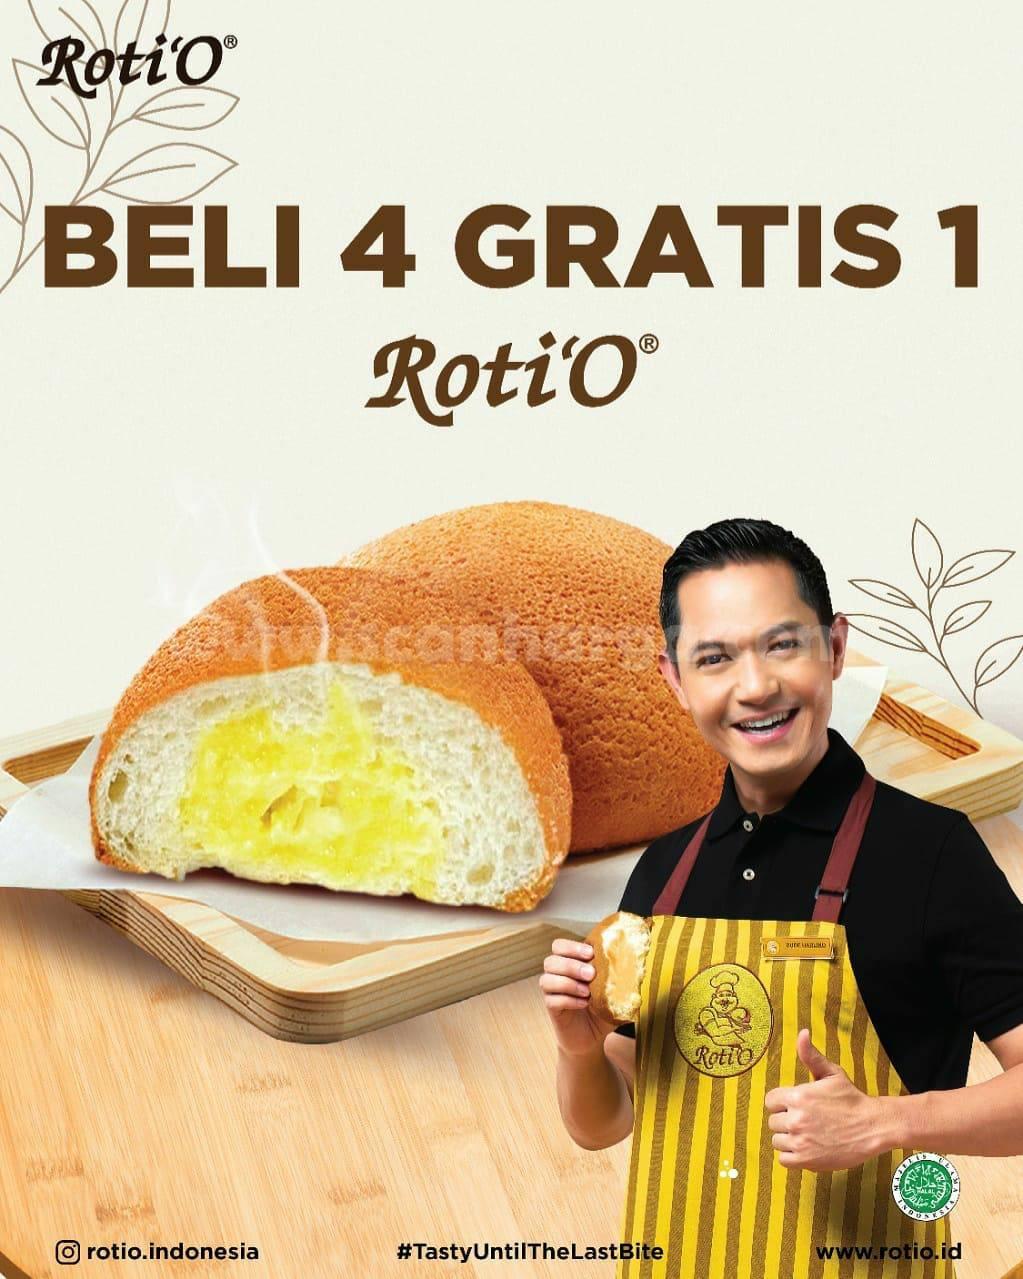 Promo ROTI'O BELI 4 GRATIS 1 ROTI O + Harga Diskon KOPI ROTIO 1